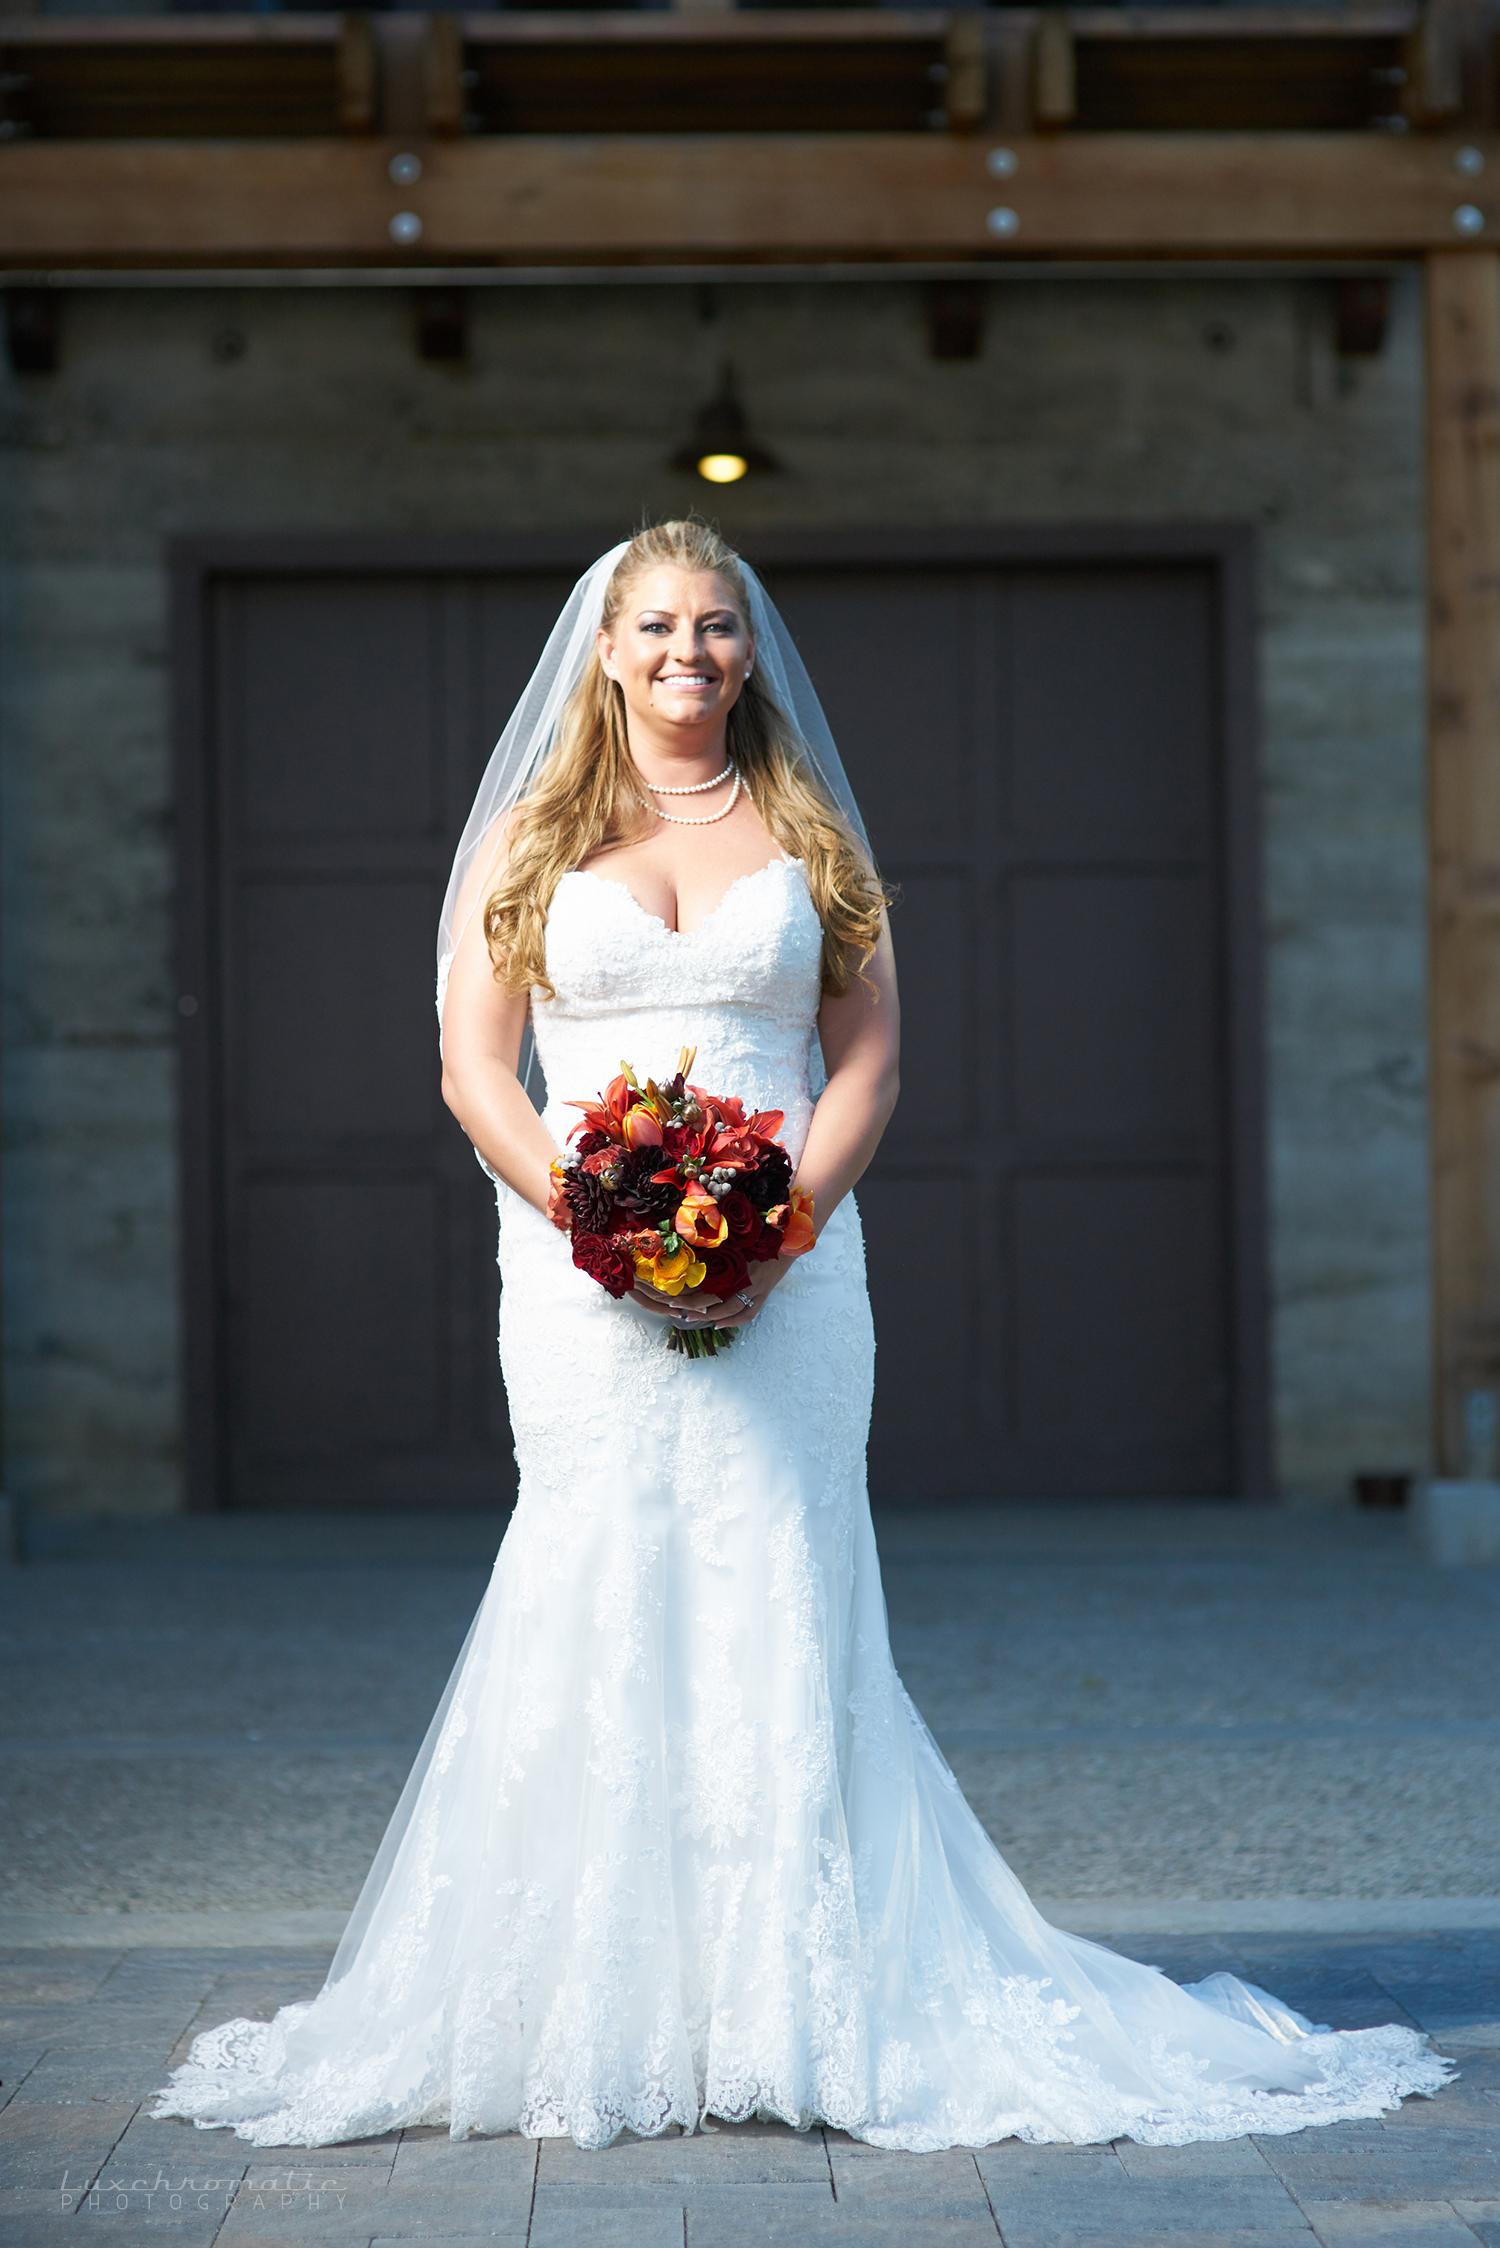 081217_Rachel_Chris_a0567-weddingdress-bride-weddingphotography-weddingphotographer-bridal-groom-wedding-engagementring-proposal-brides-diamondring-sonyalpha-sony-sonya9-sonya7rii-sanfrancisco-sf-bayarea-photographer-profoto-murrietas-well.jpg